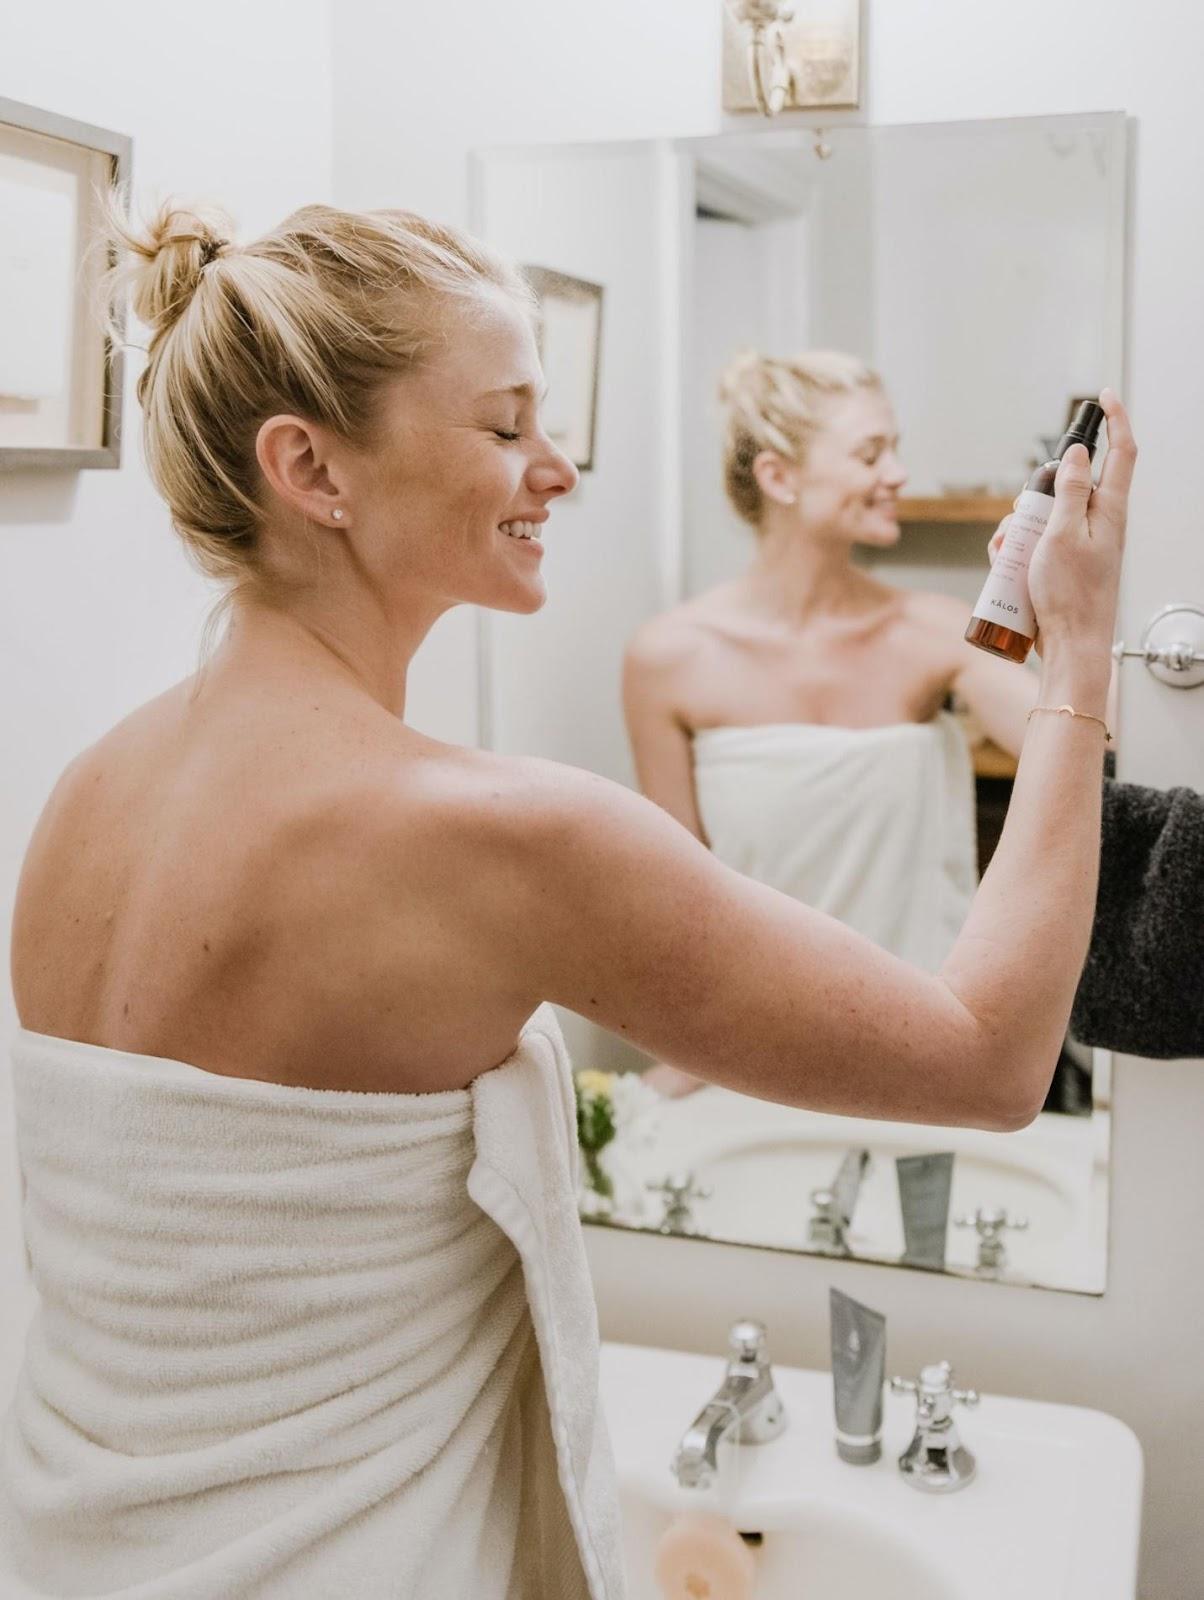 natural finish makeup application and skin care